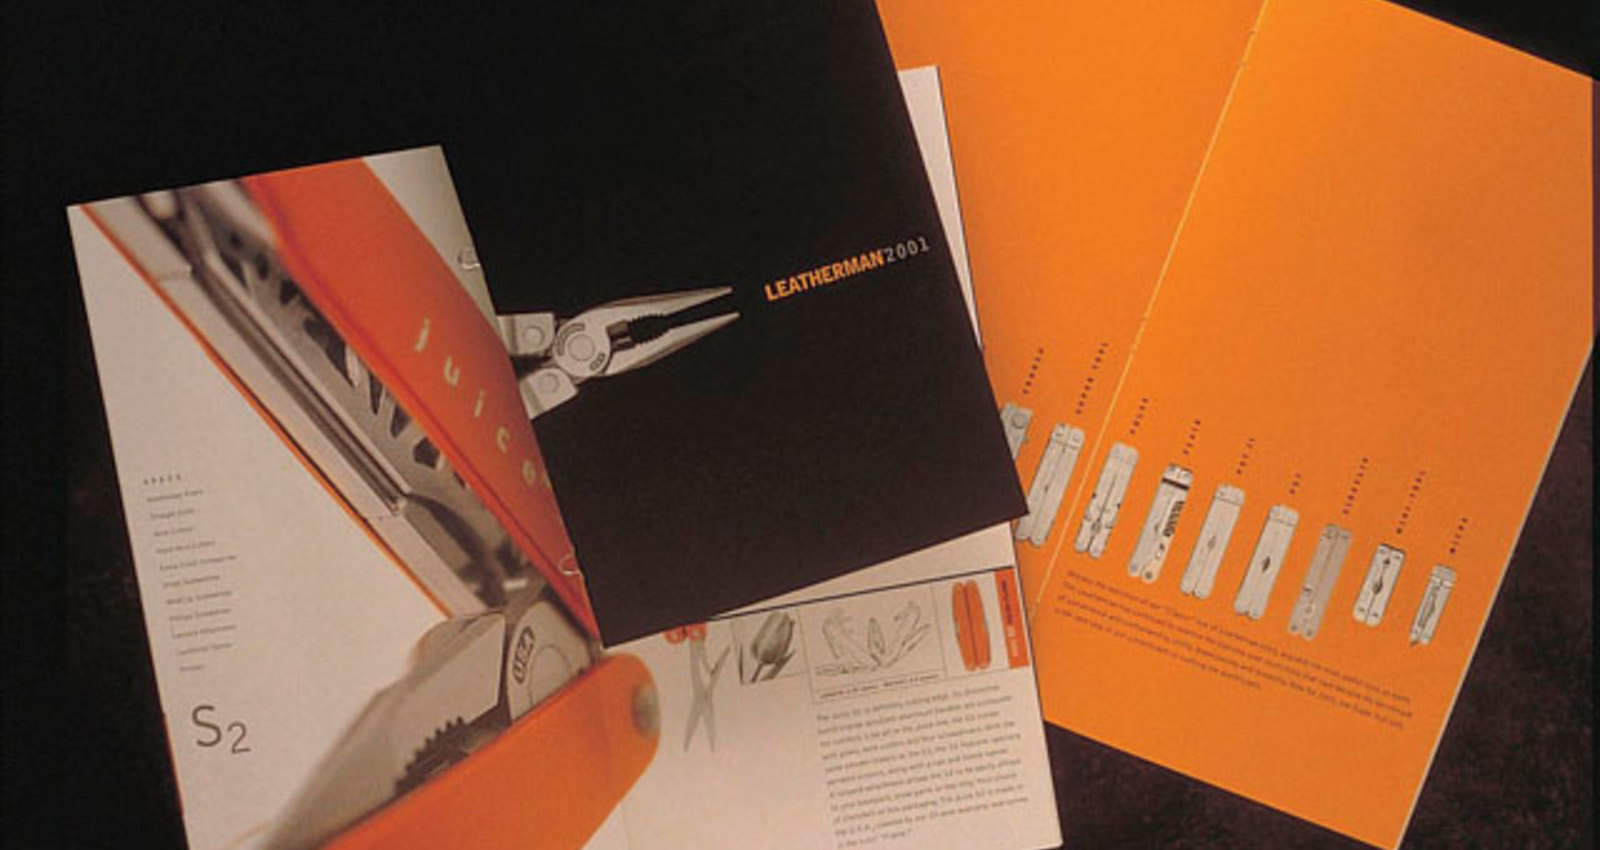 Leatherman Tools 2001 Product Catalog